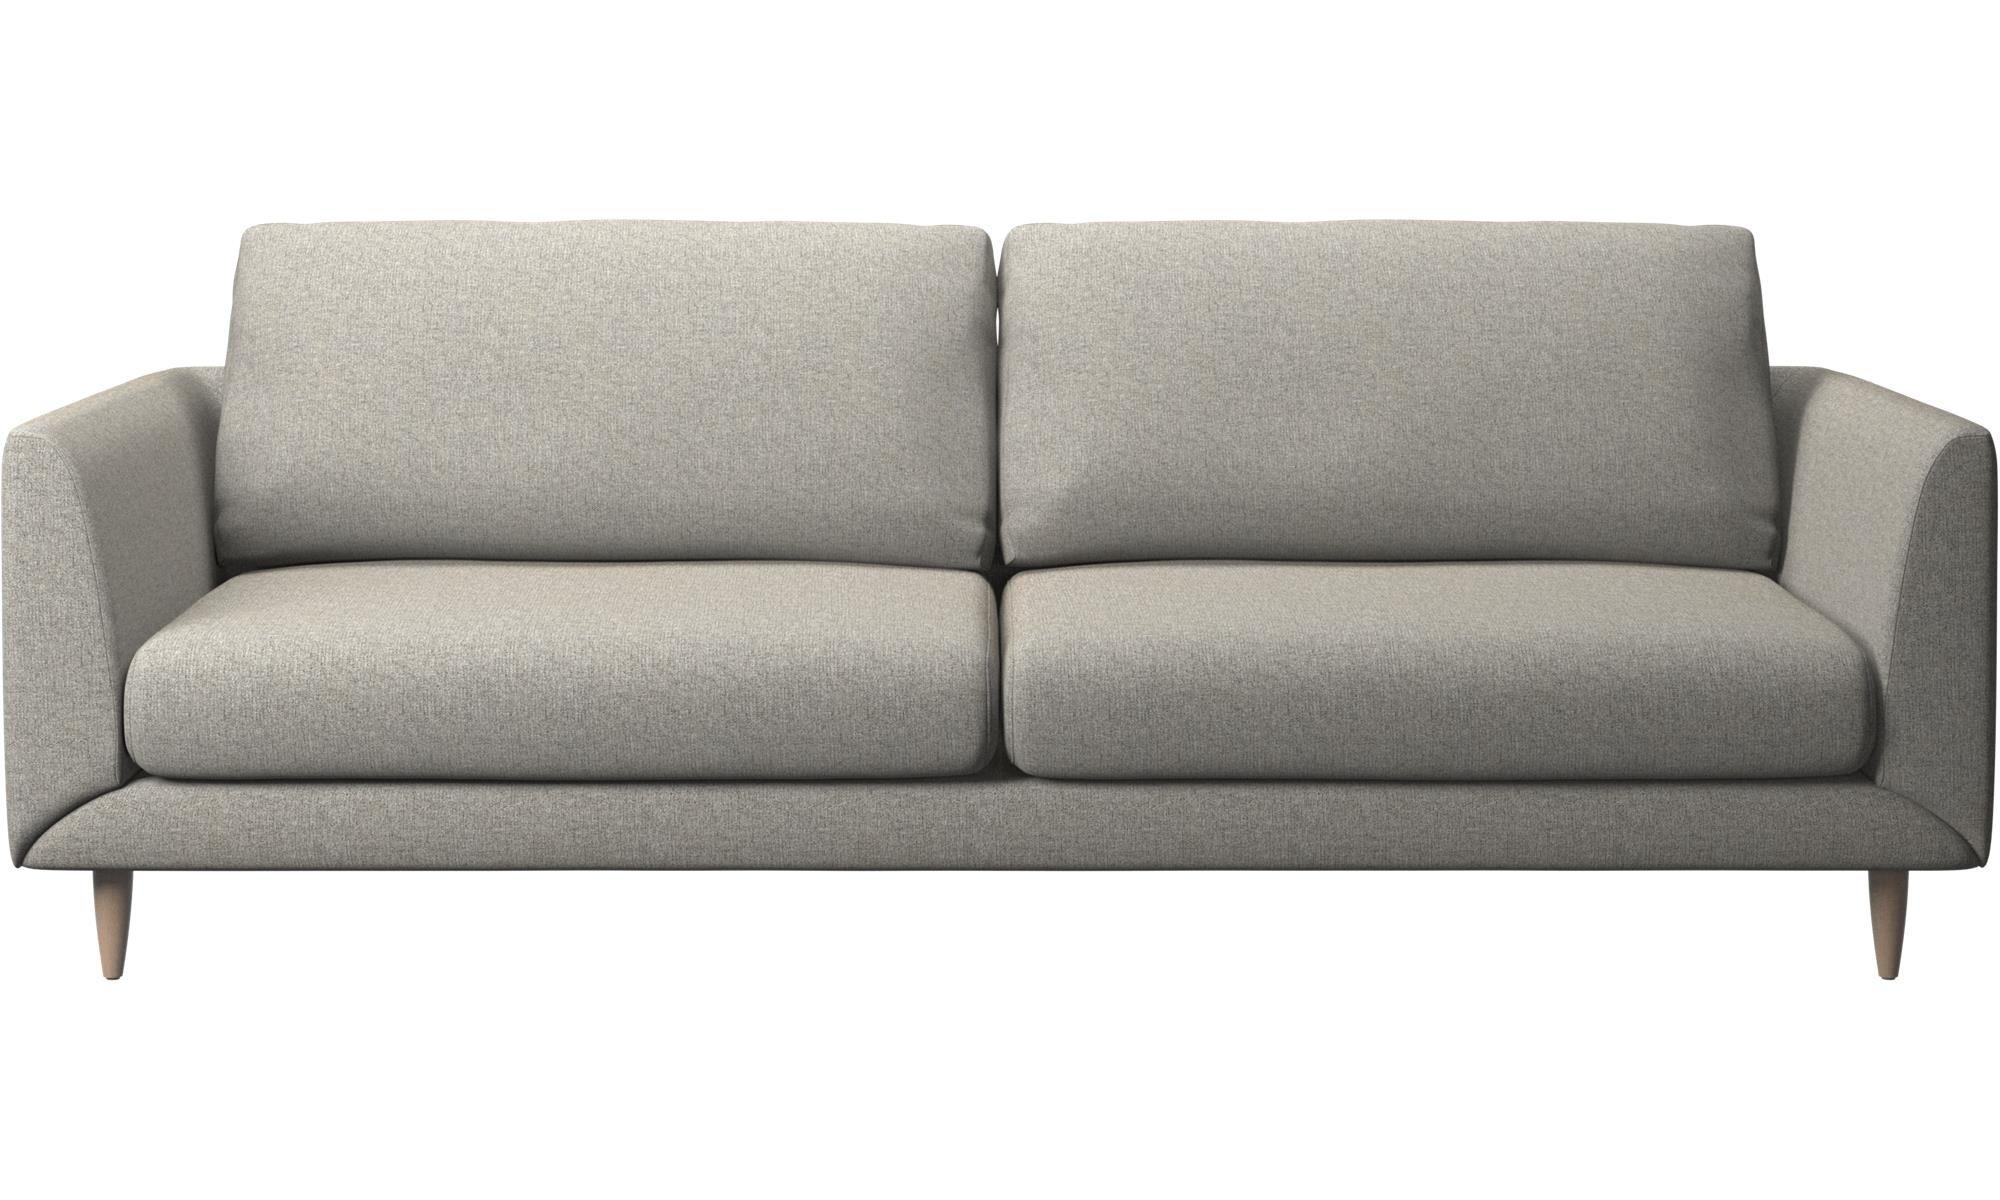 Fargo Sofa Seater Sofa Sofa Modular Sofa Design